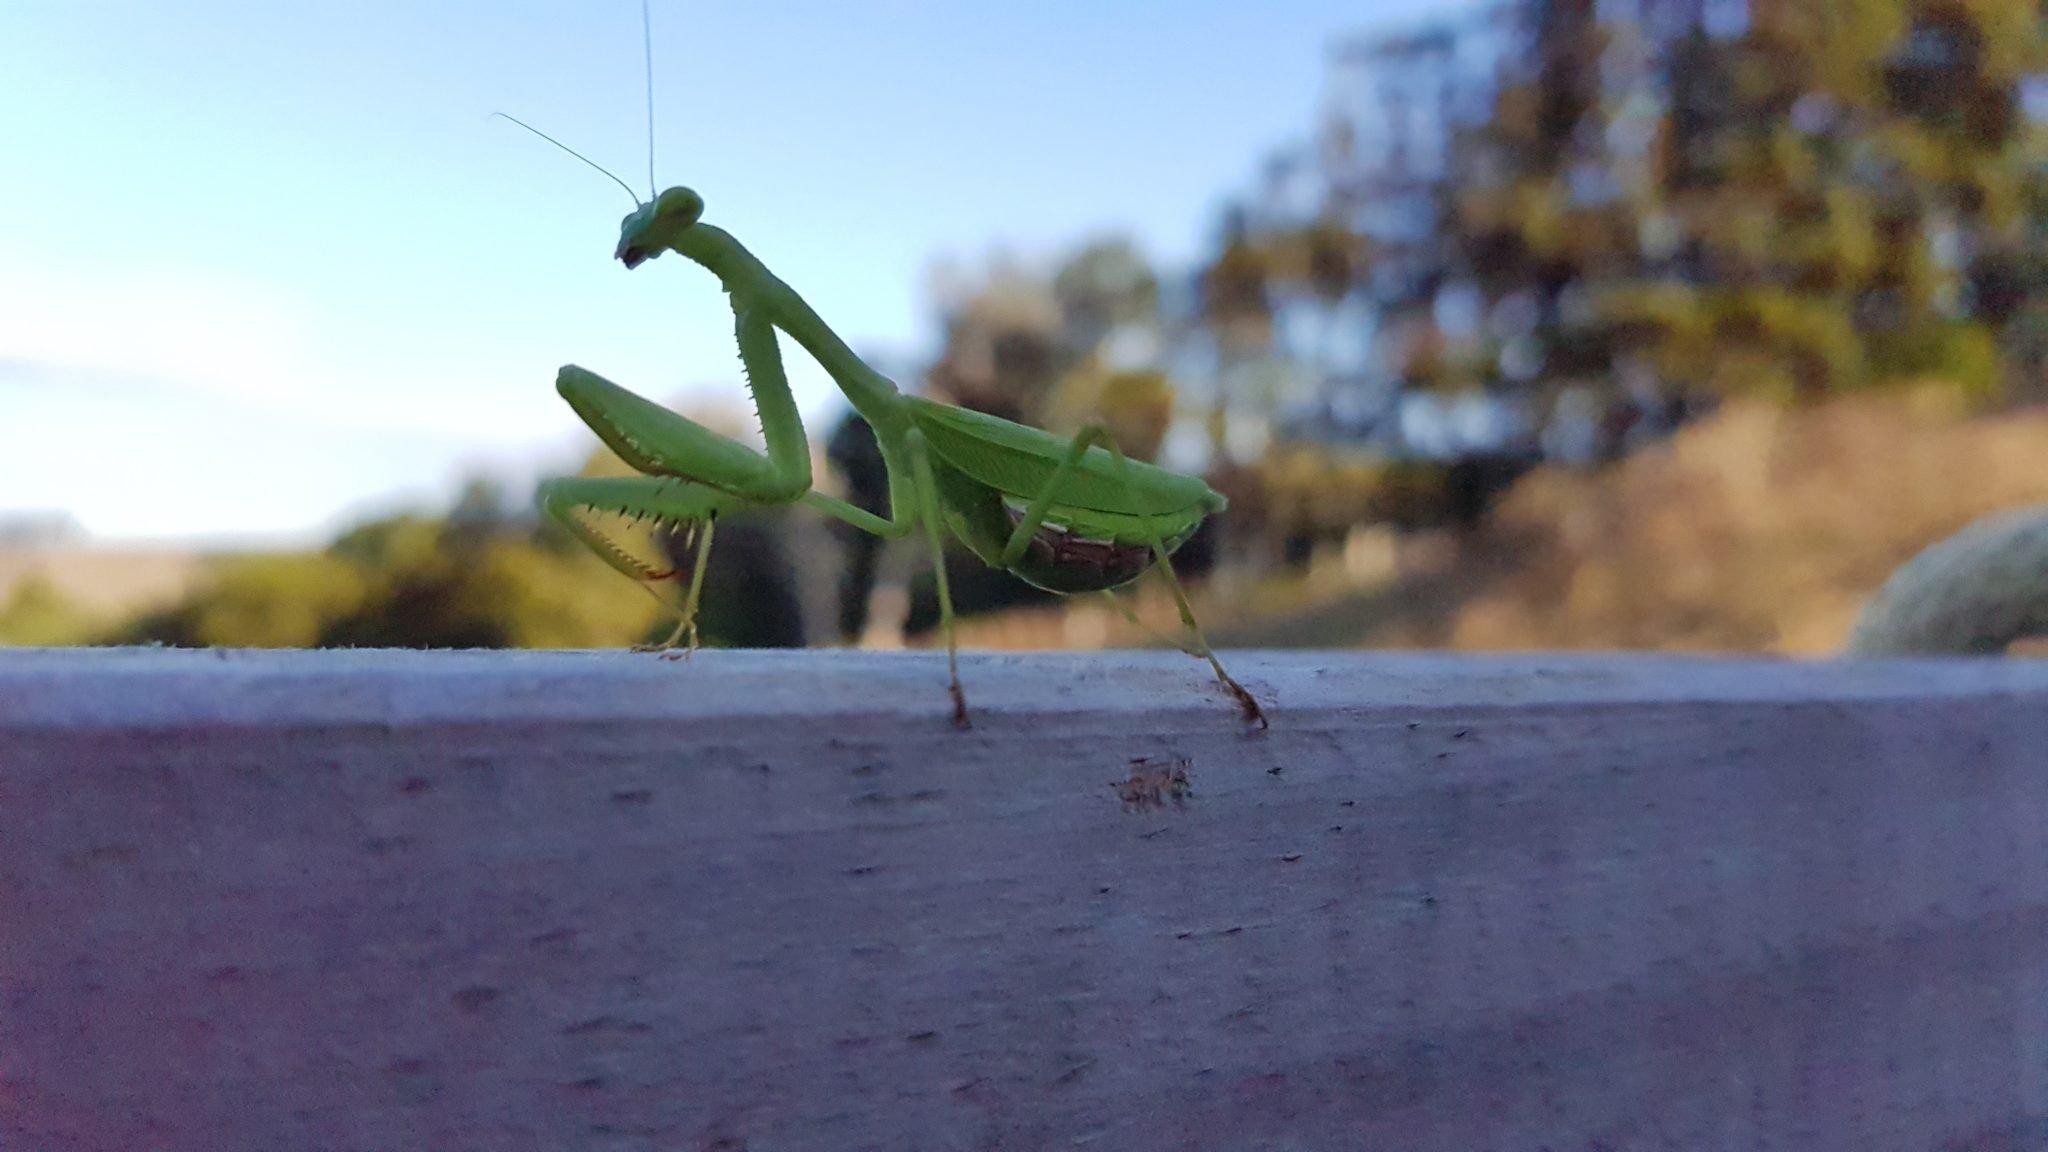 closeup view of praying mantis on a timber handrail